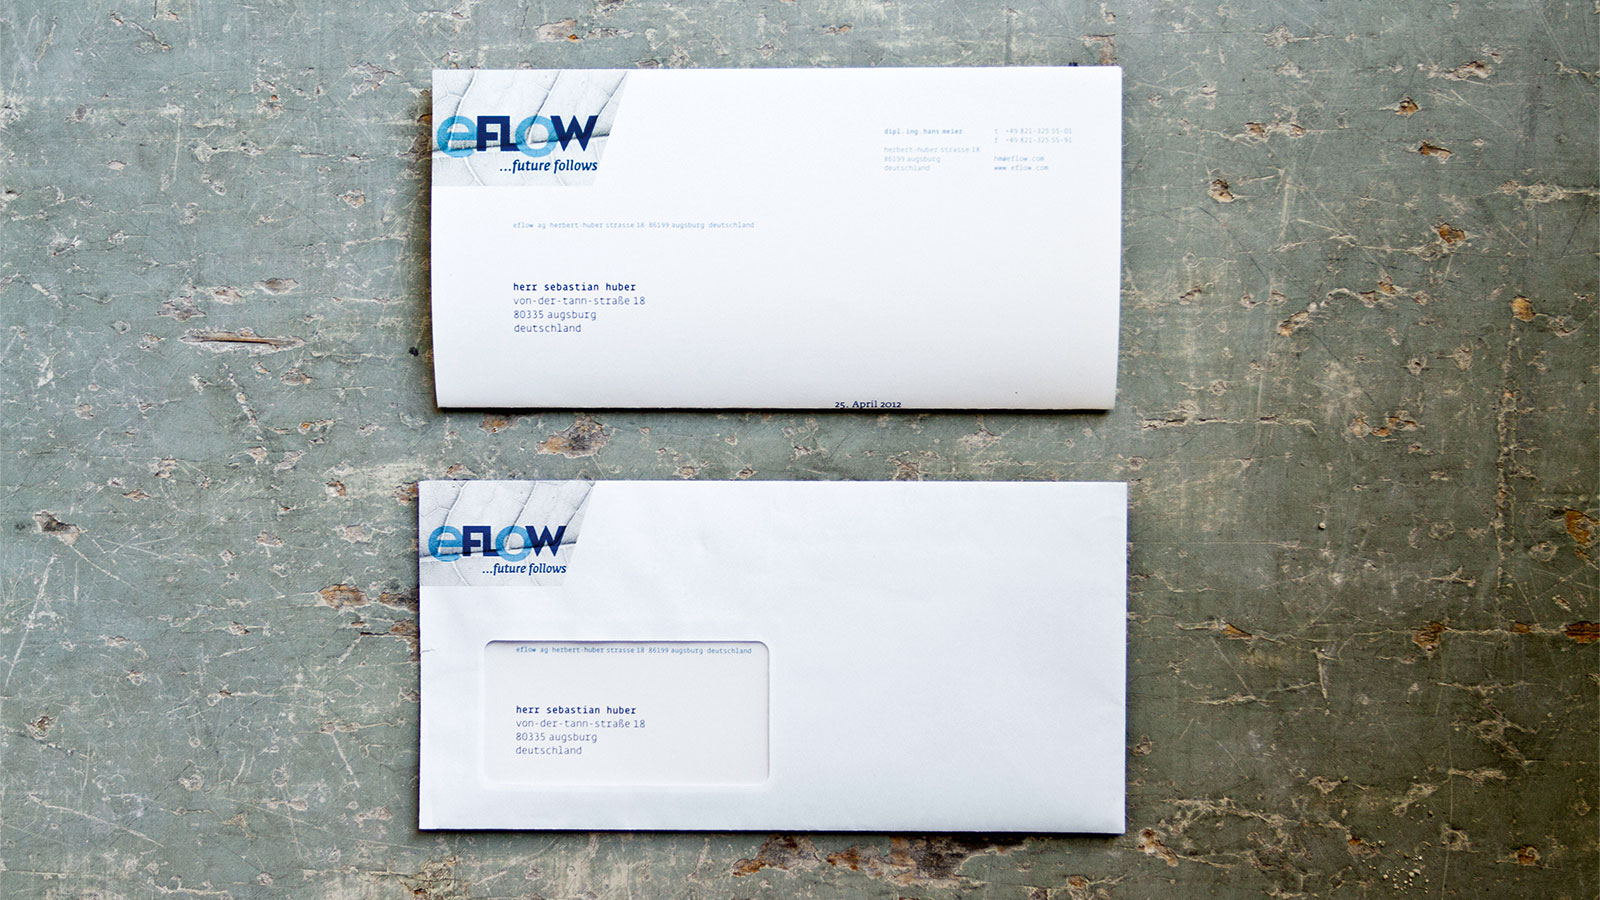 eflow-1600x900-3